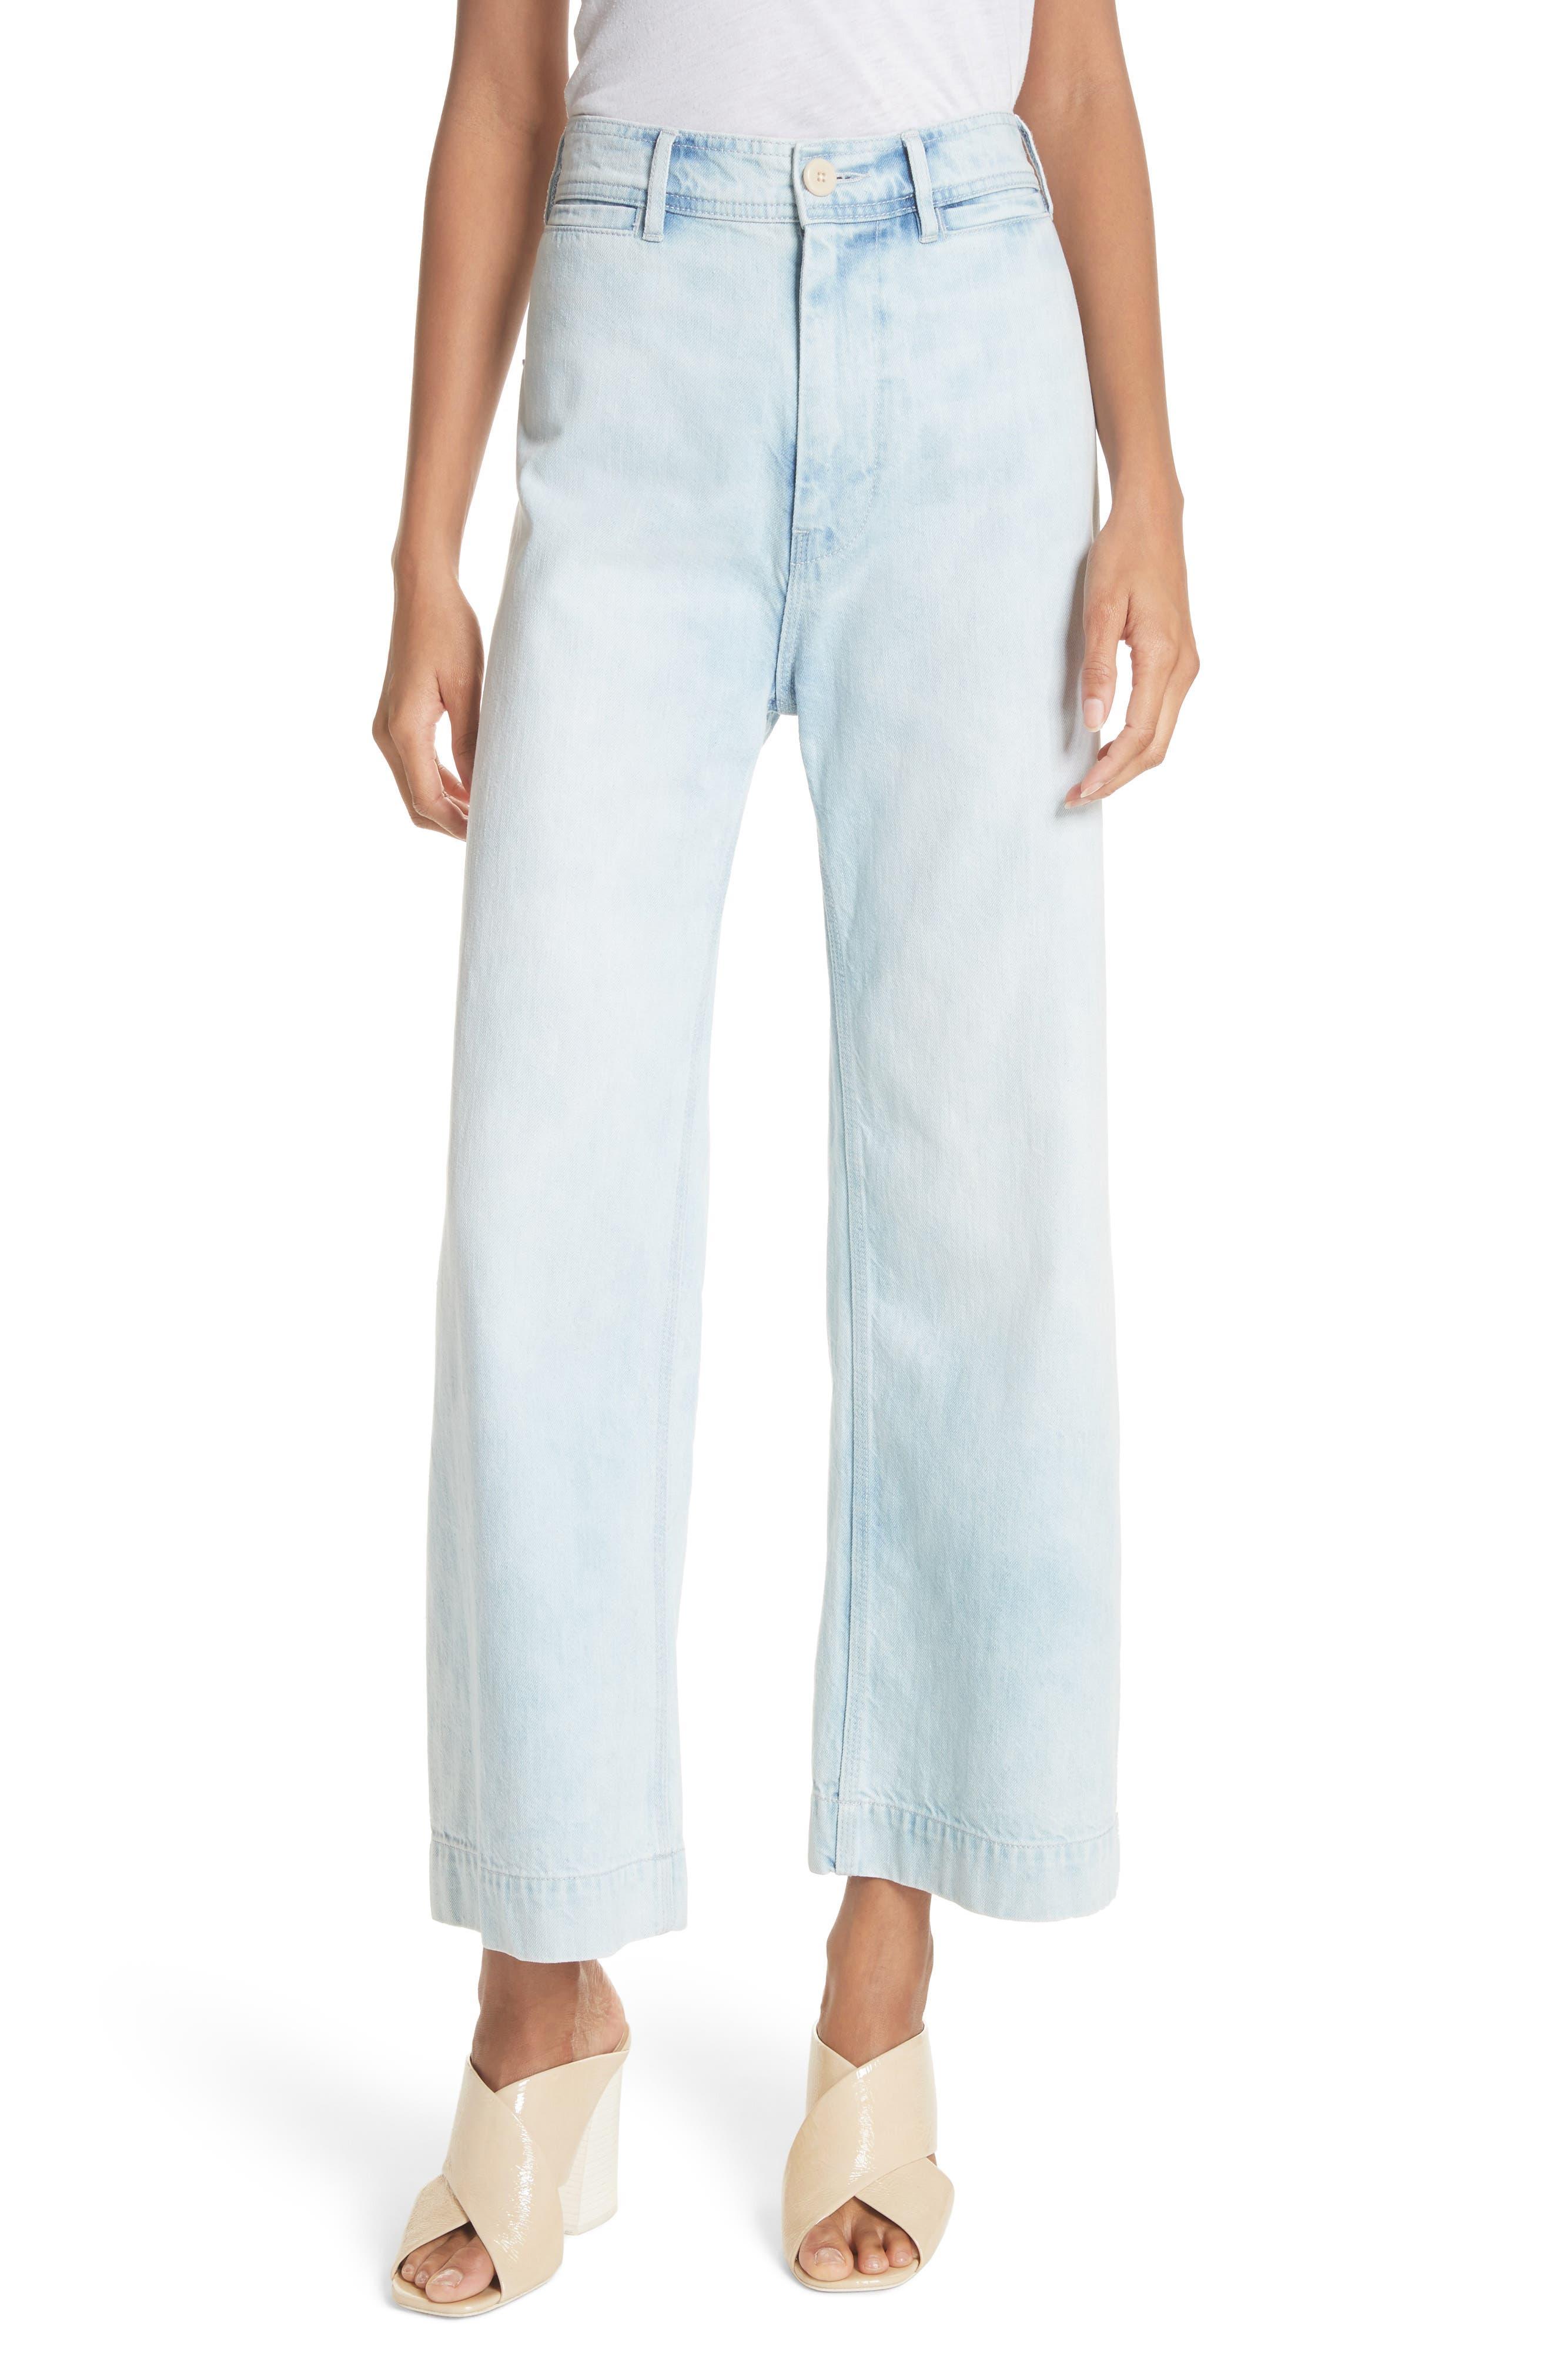 Main Image - La Vie Rebecca Taylor Crop Wide Leg Jeans (Nuage Wash)